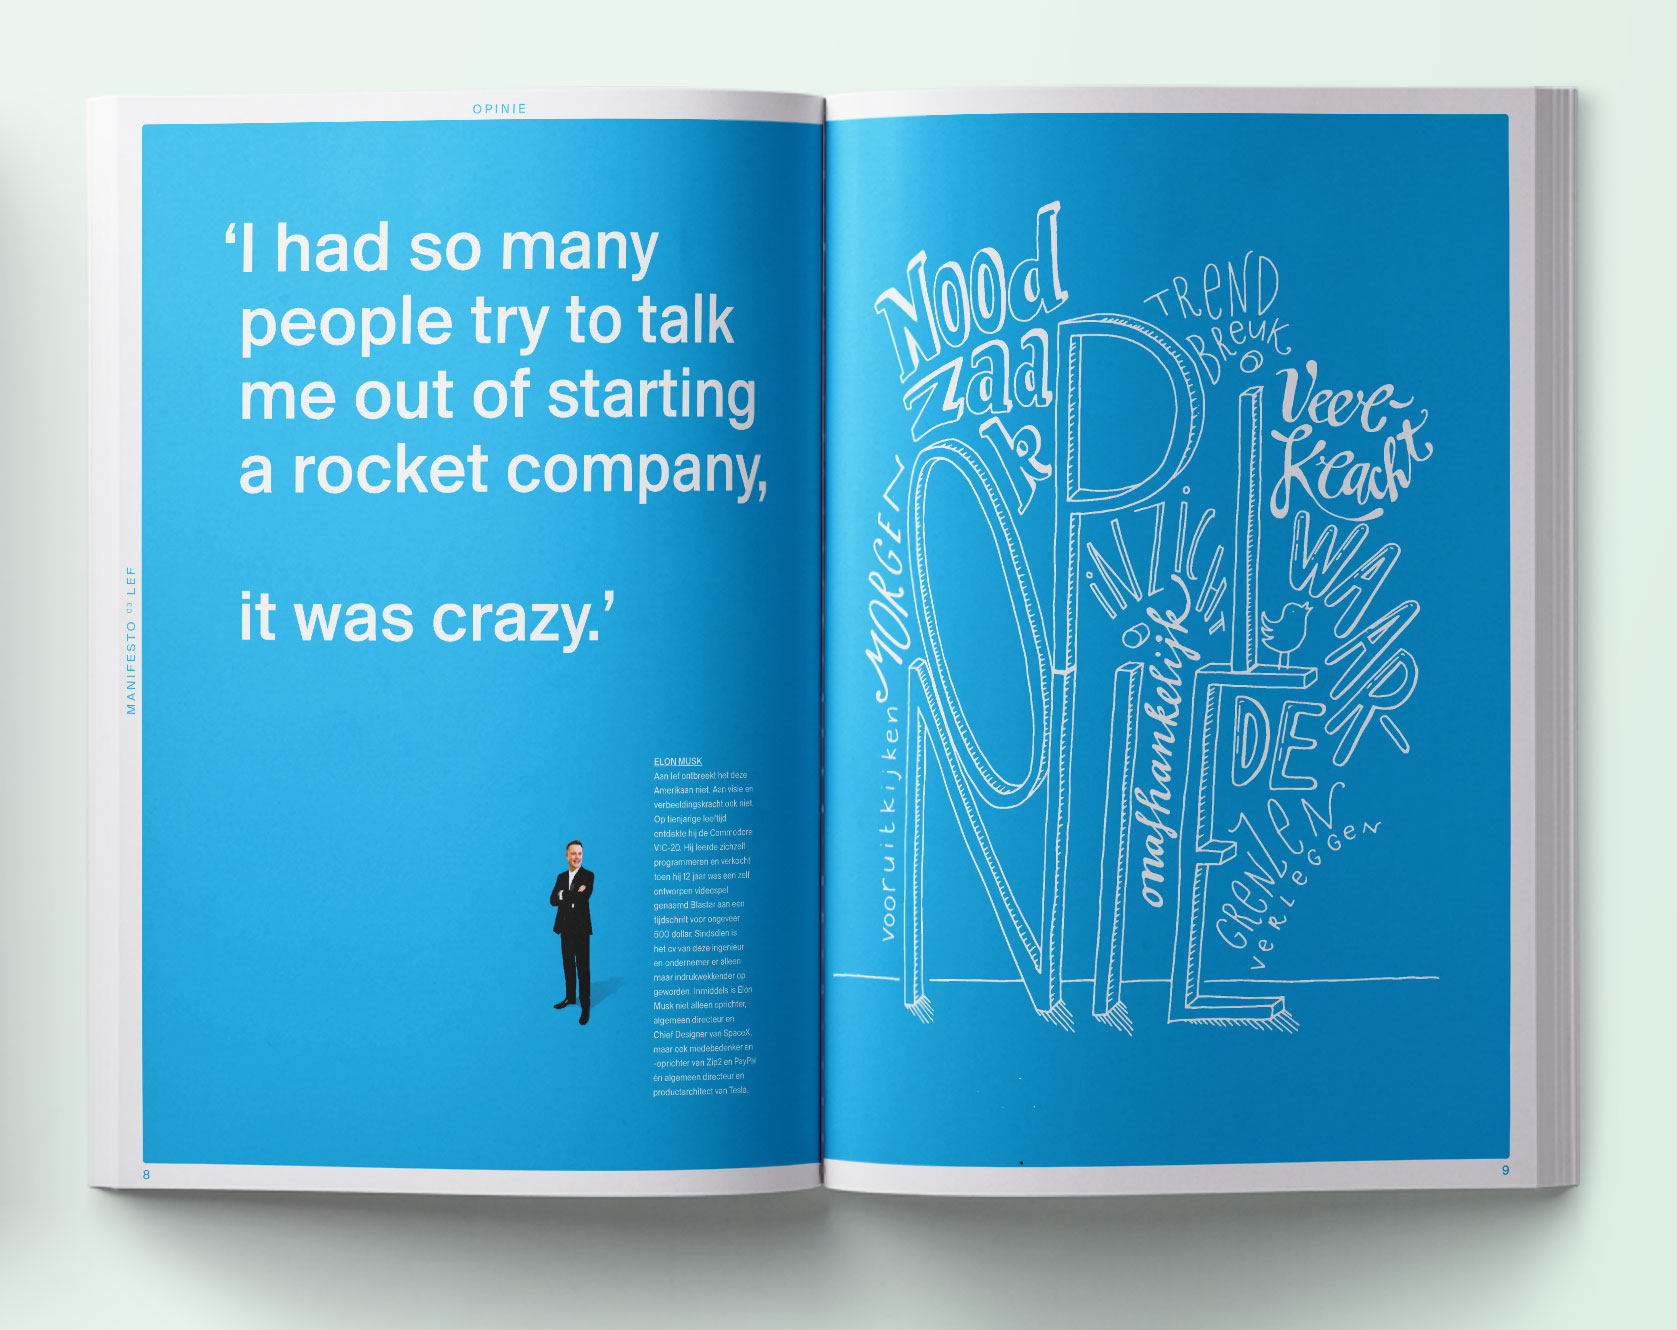 KAZEZE-grafisch-ontwerp-Amsterdam-illustraties-magazine-handgetekende-letters-handlettering-manifesto#4-07_spread6.jpg